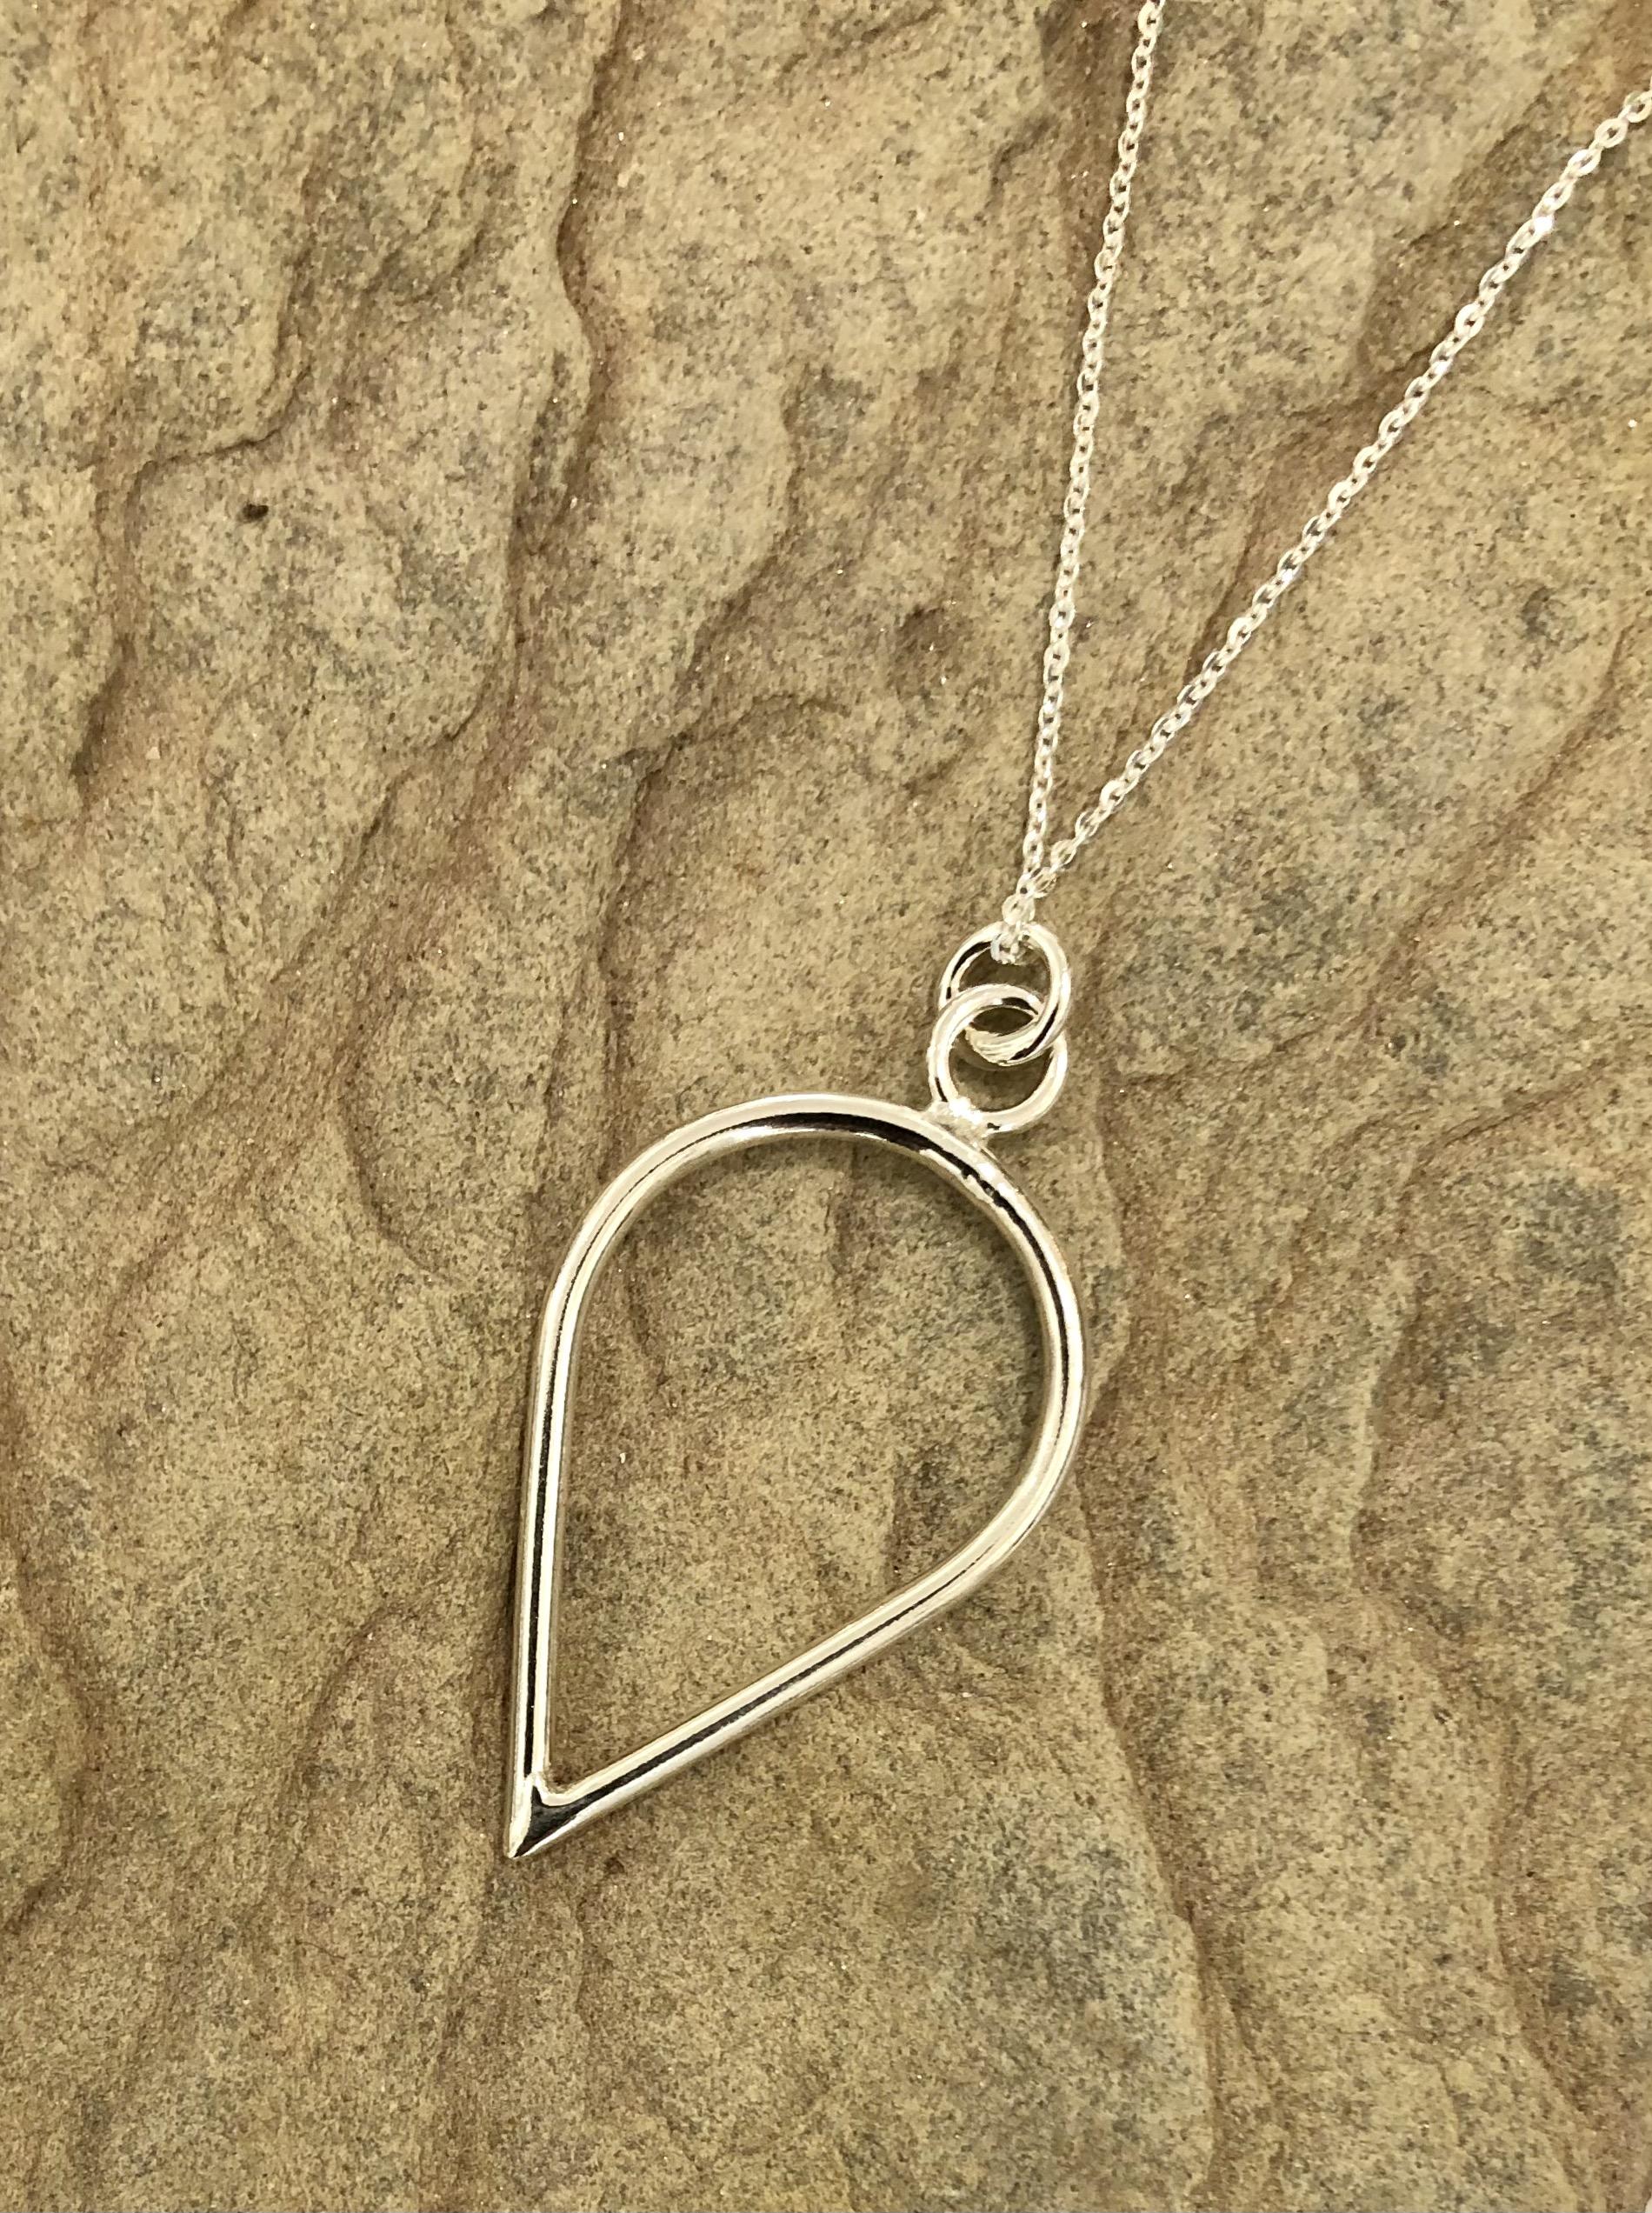 Sterling silver teardrop Pendant, by Devon based silversmith Claire Lowe.